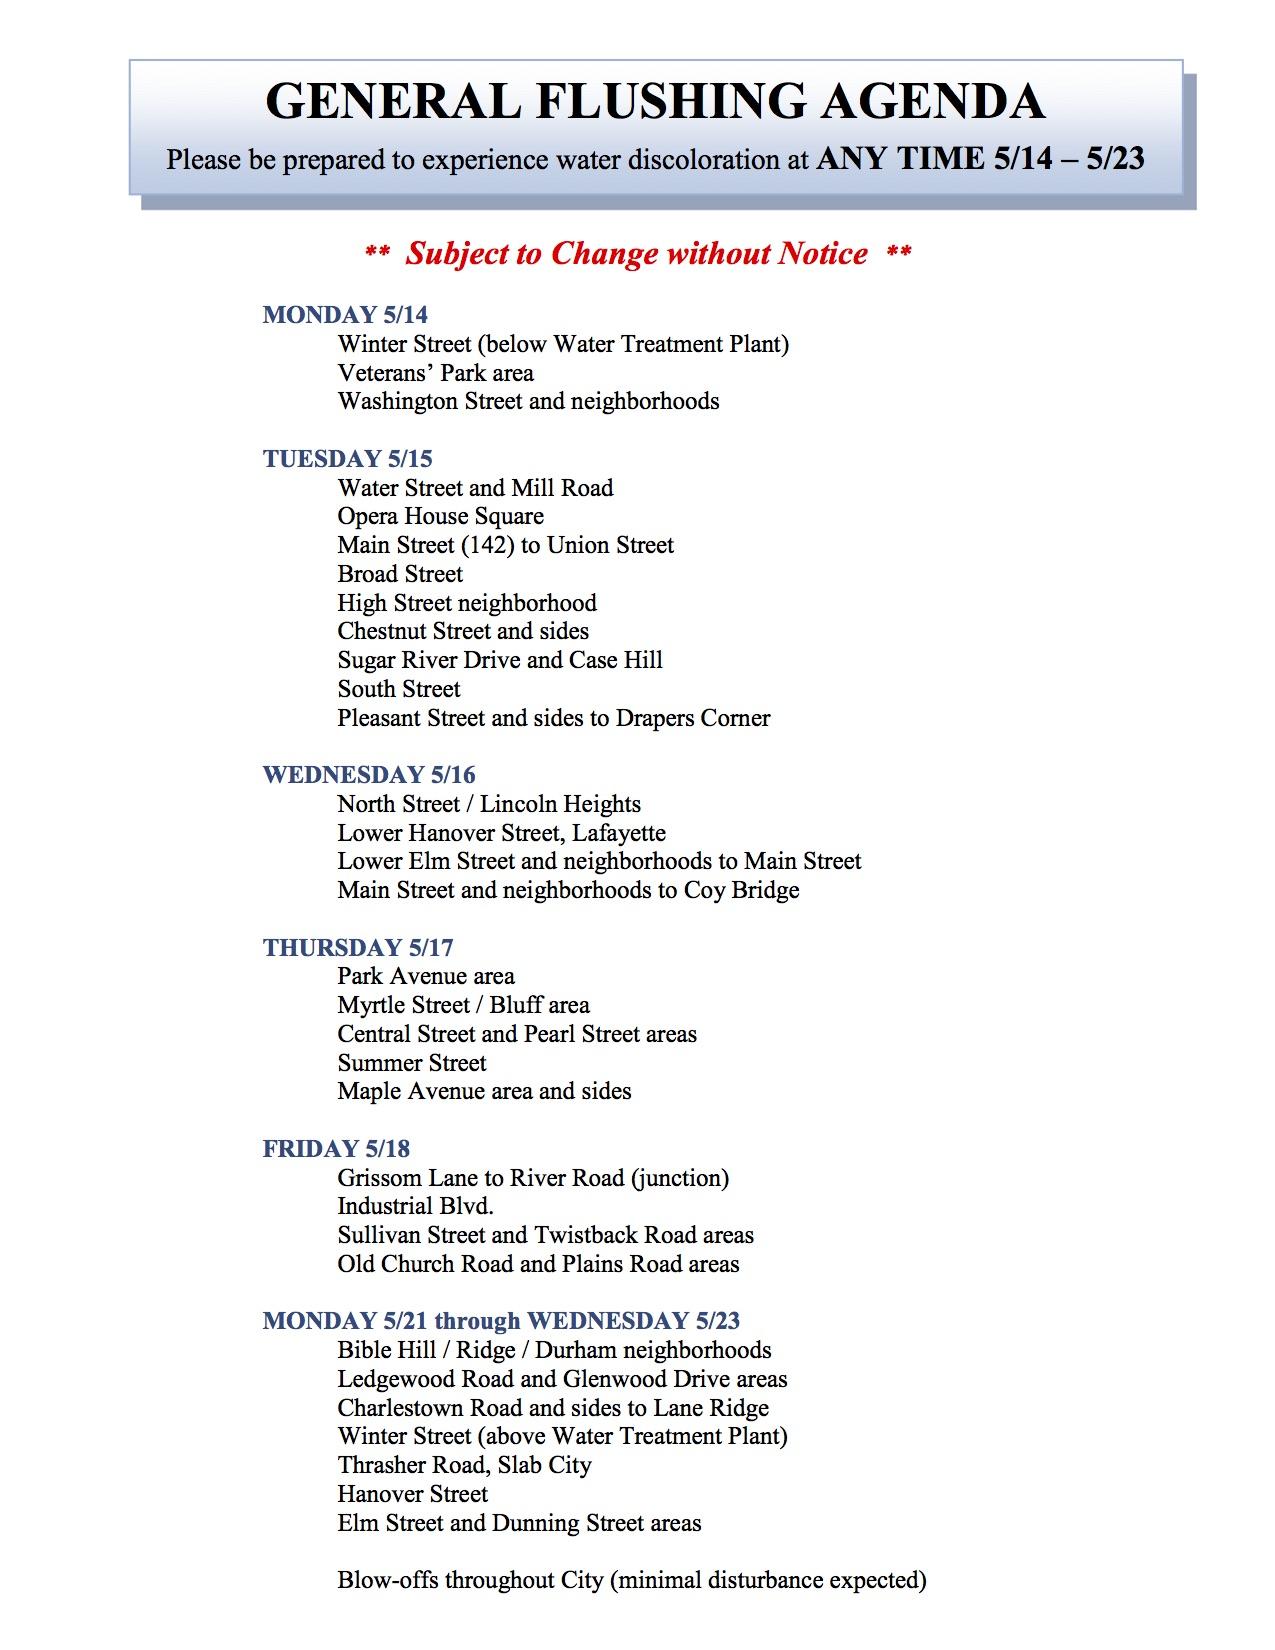 Claremont Water Main Flushing Schedule